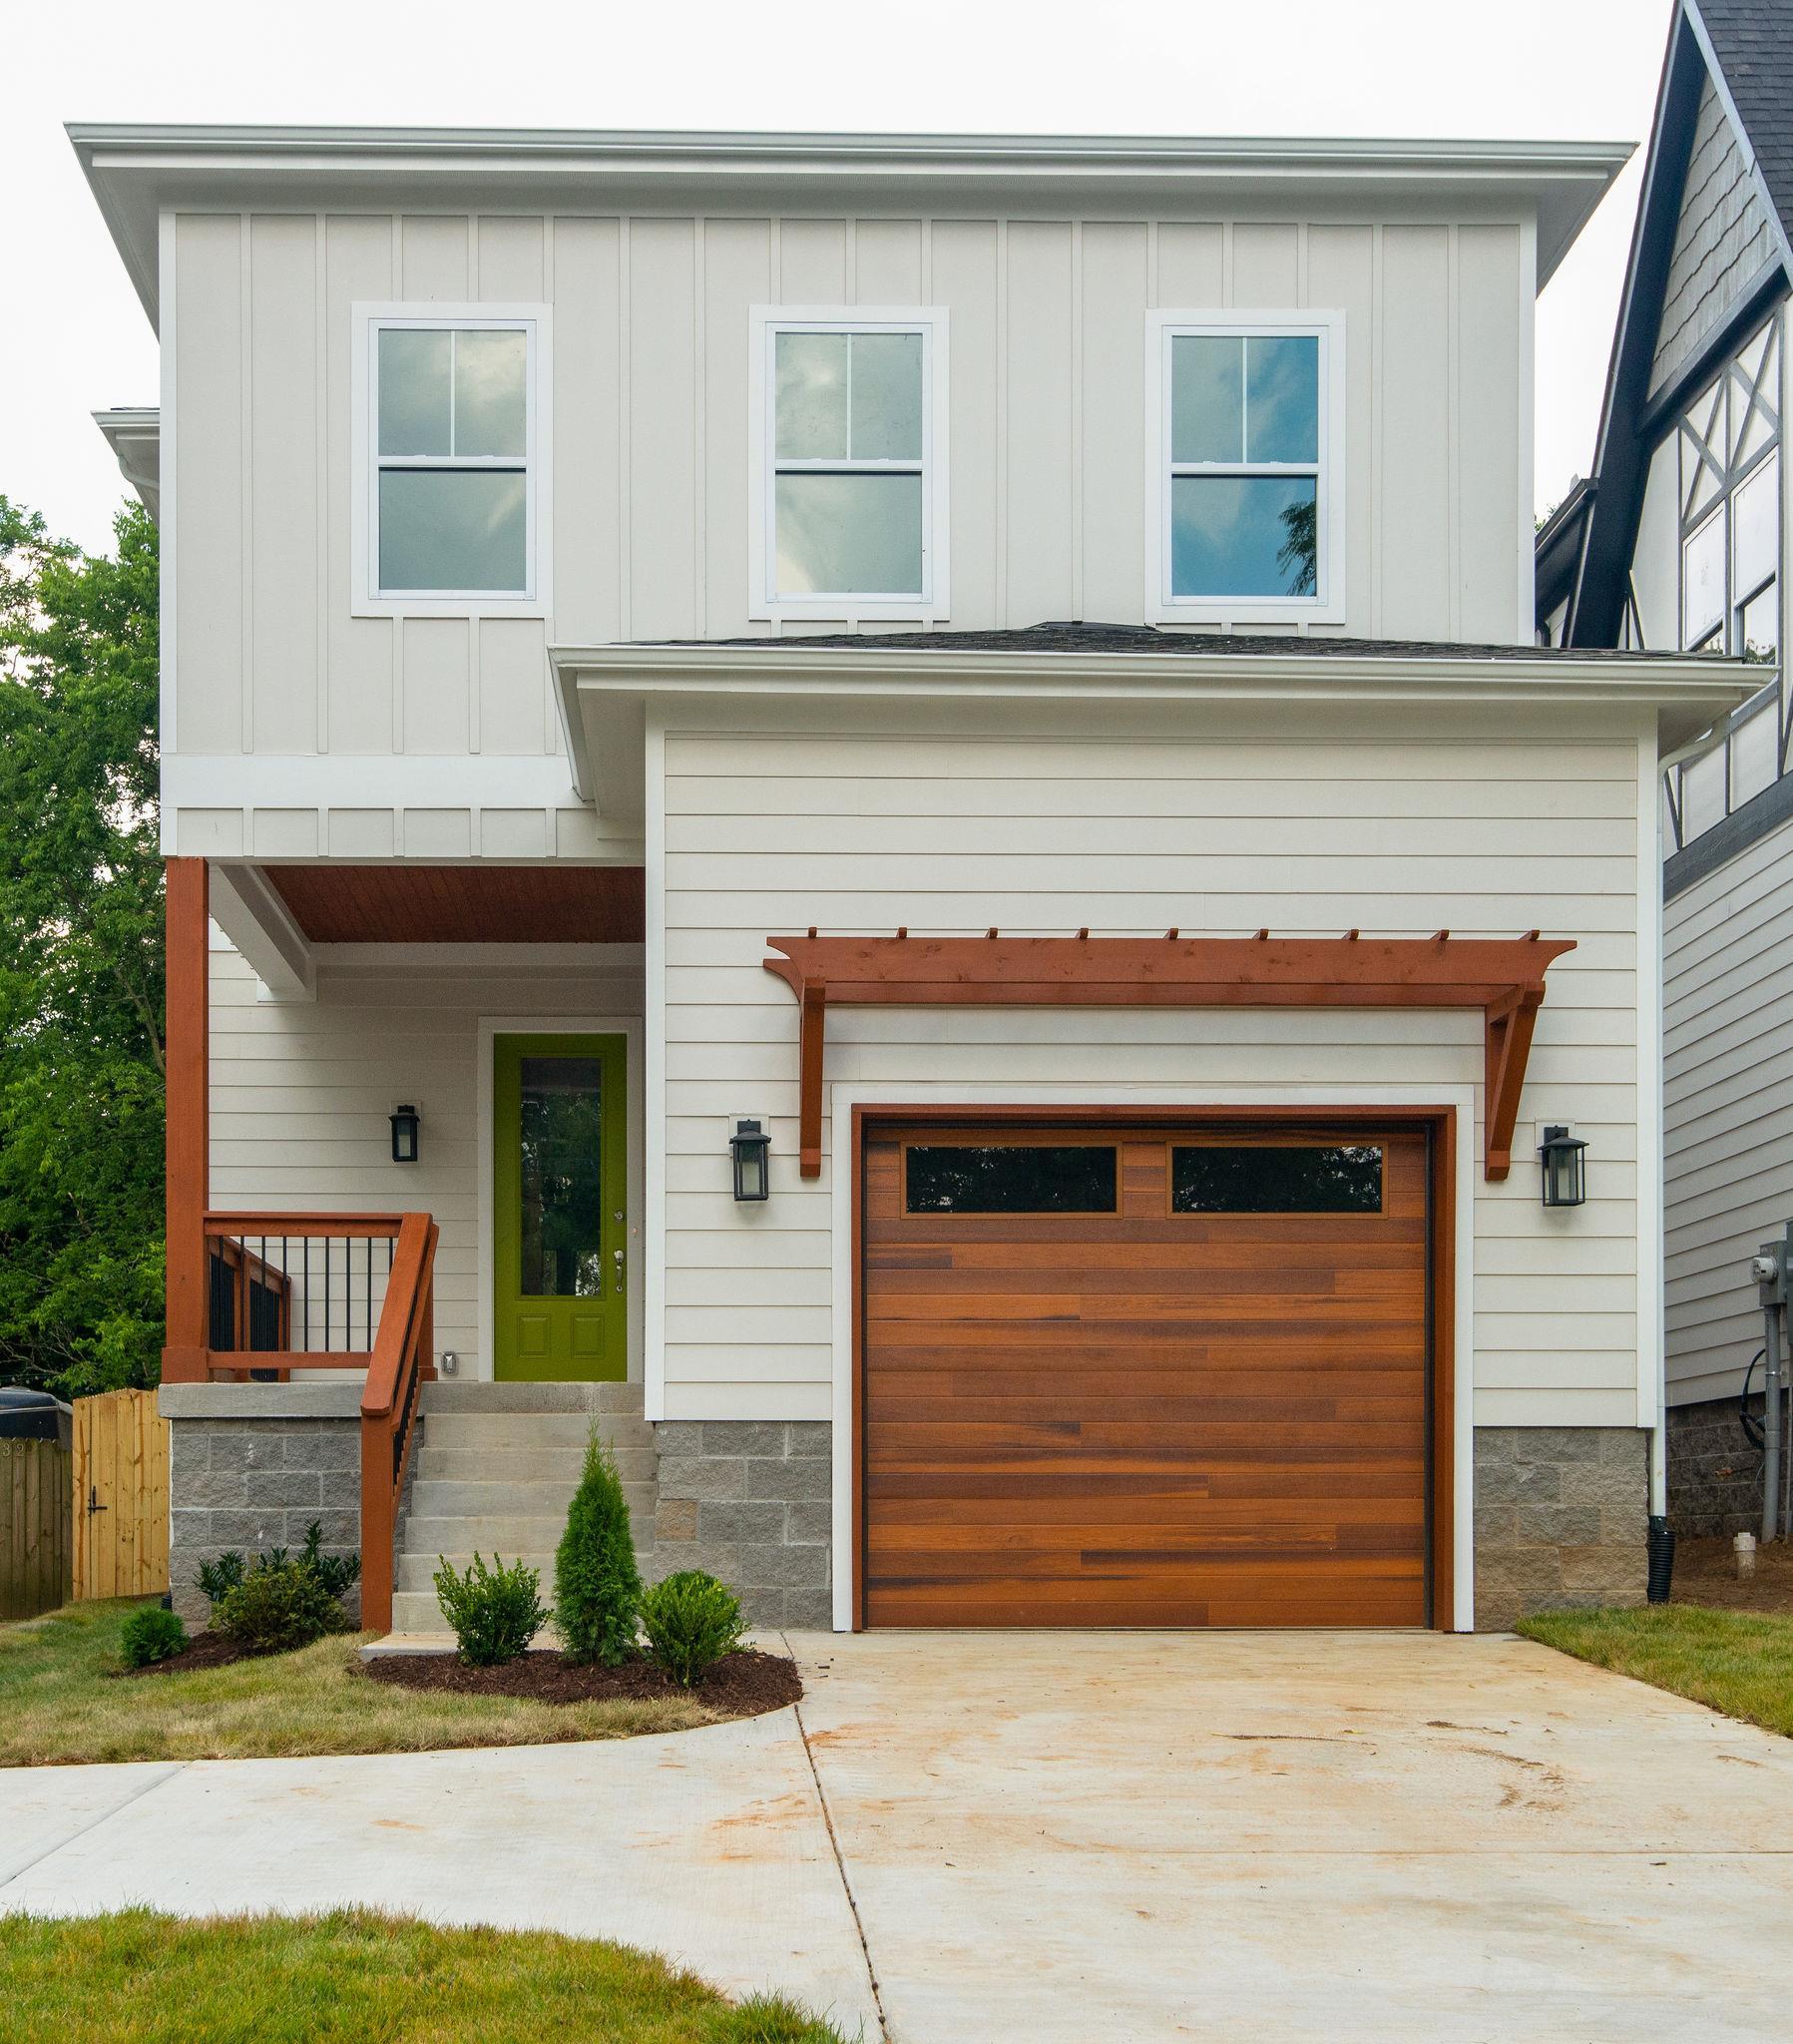 2230B Carter Ave, Nashville, TN 37206 - Nashville, TN real estate listing